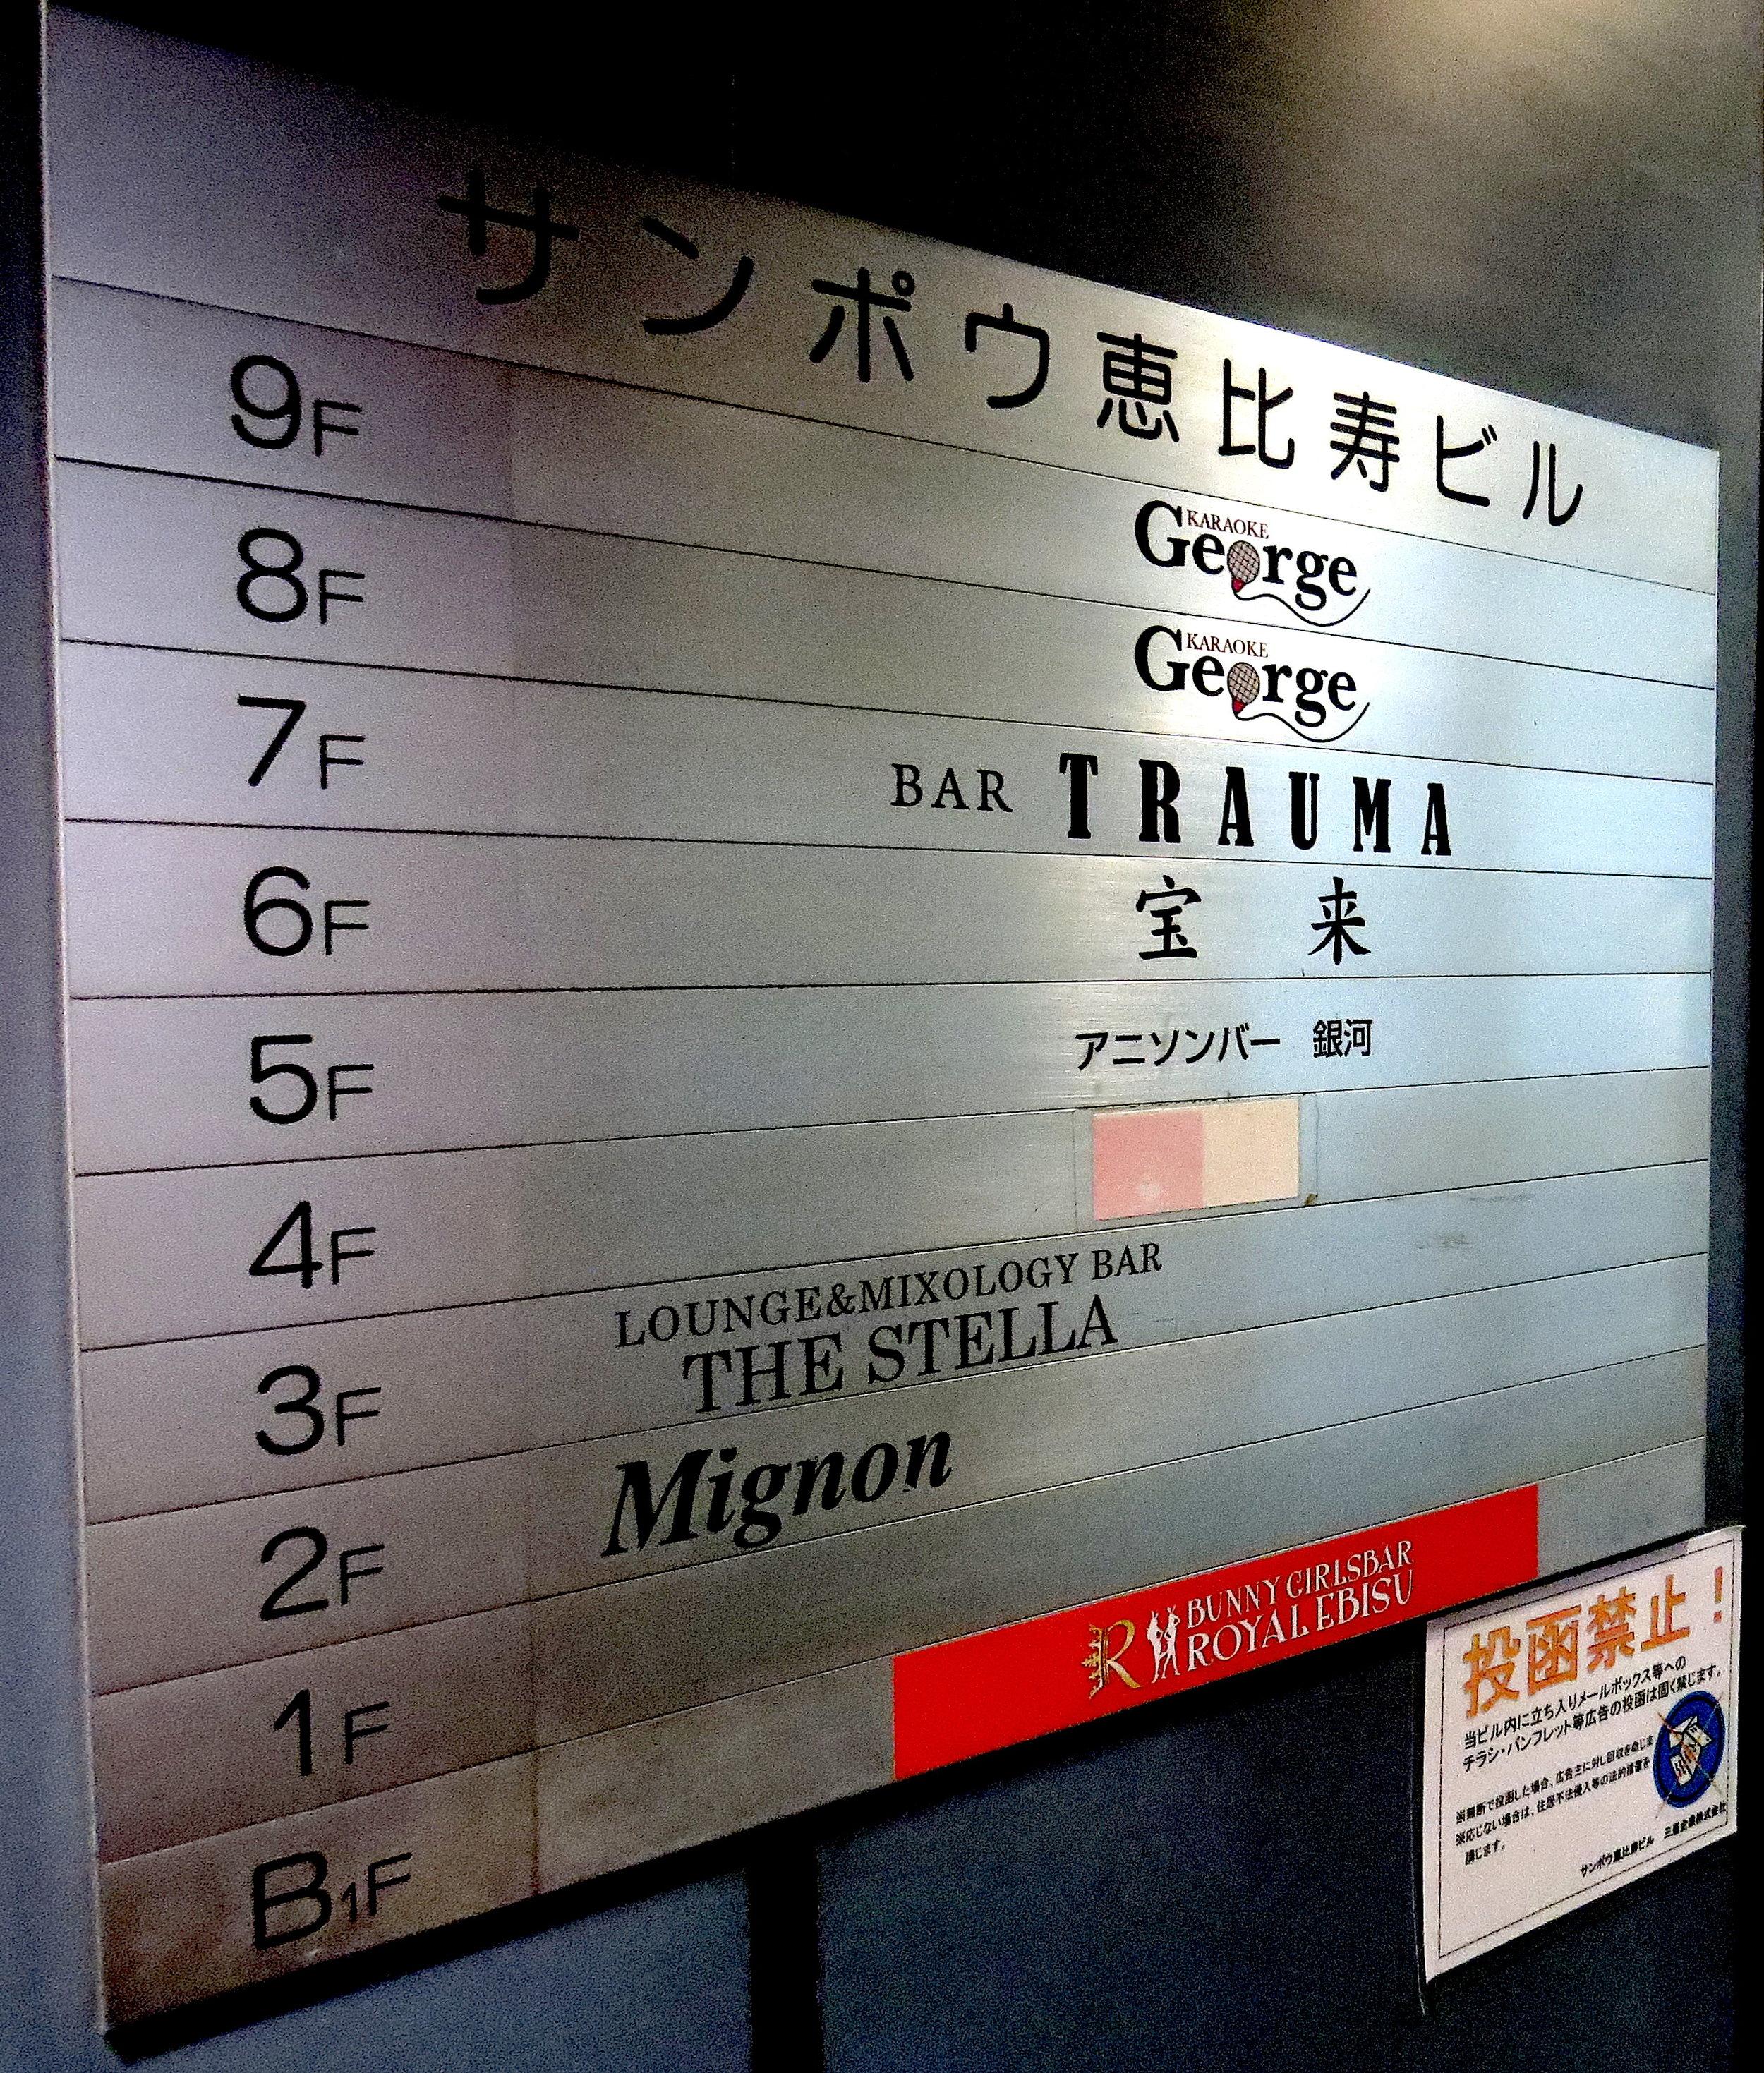 sanpo-ebisu-building-bar-trauma.JPG